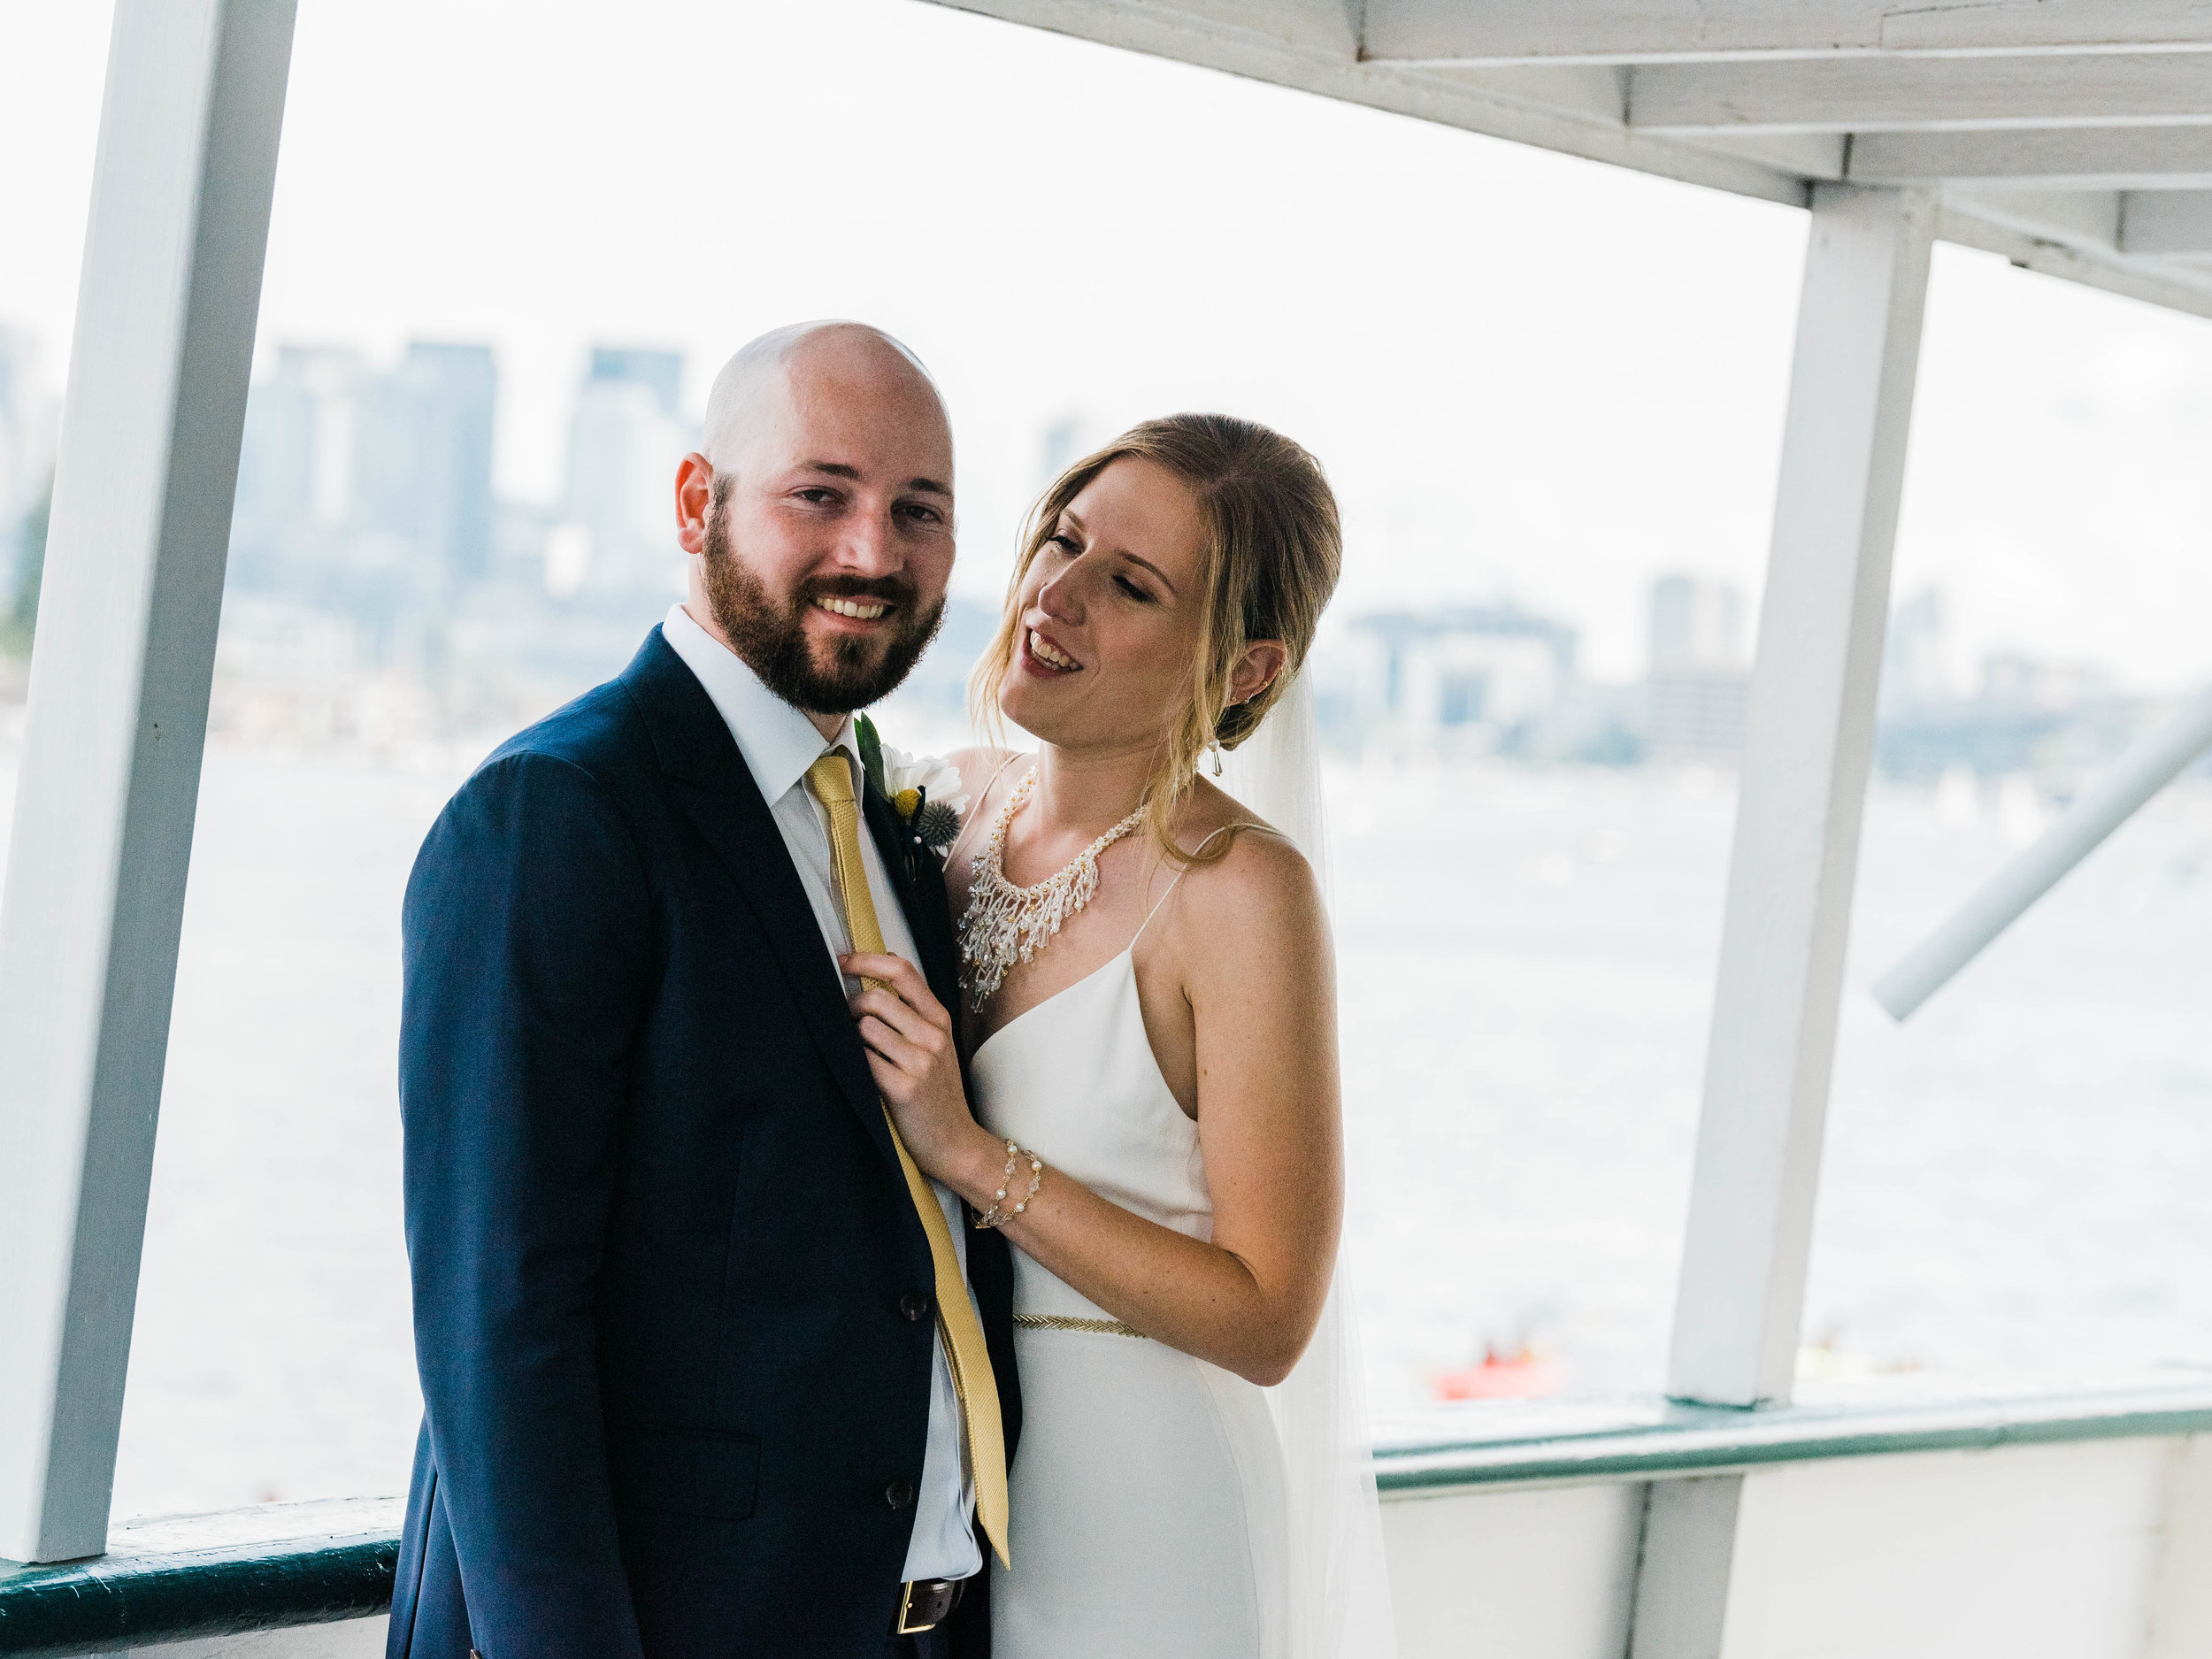 Seattle Wedding- MV Skansonia - Anna + Josh -  (1157) - Copy.jpg